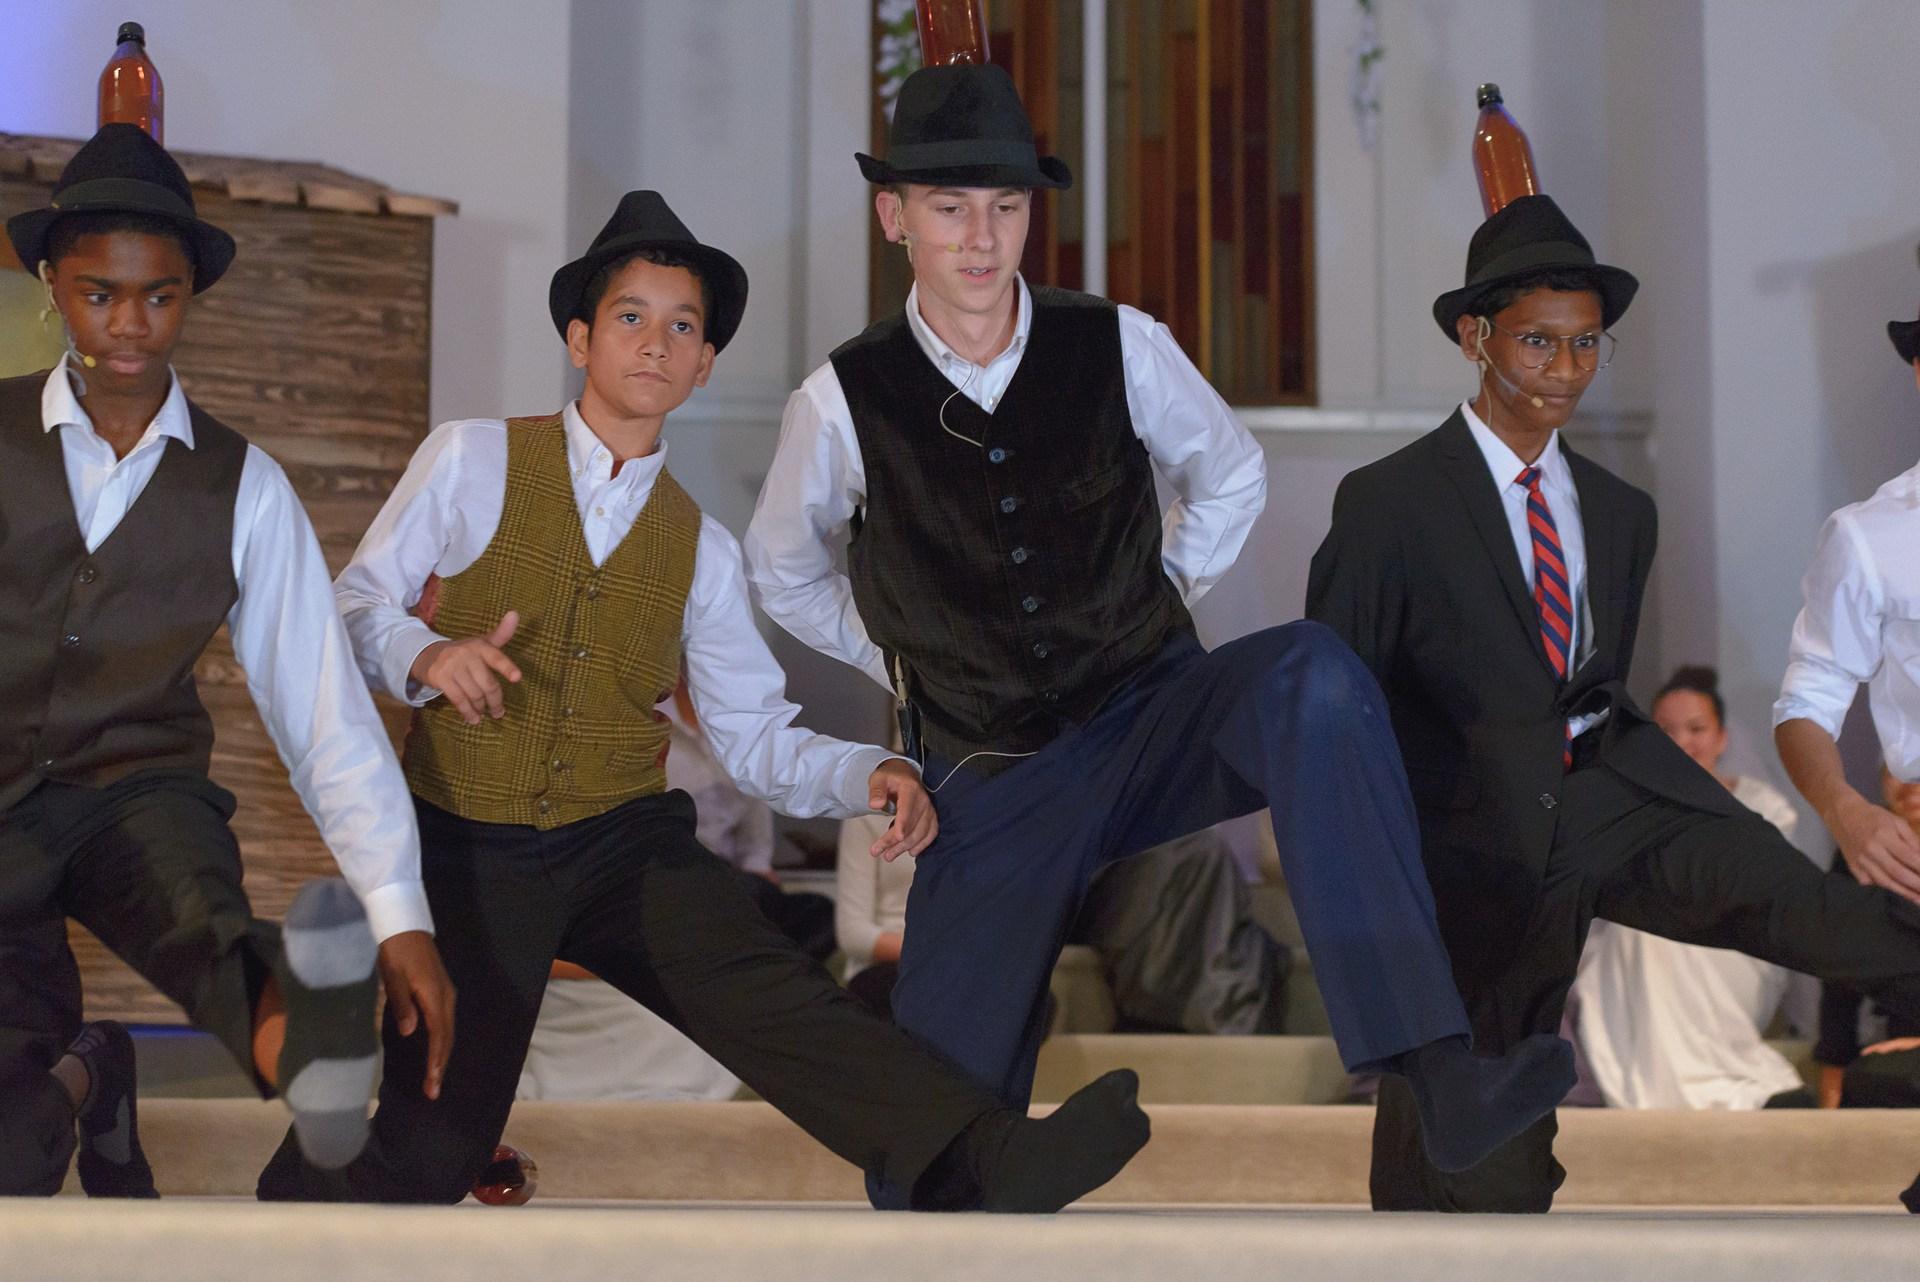 Dance scene from Fiddler on the Roof